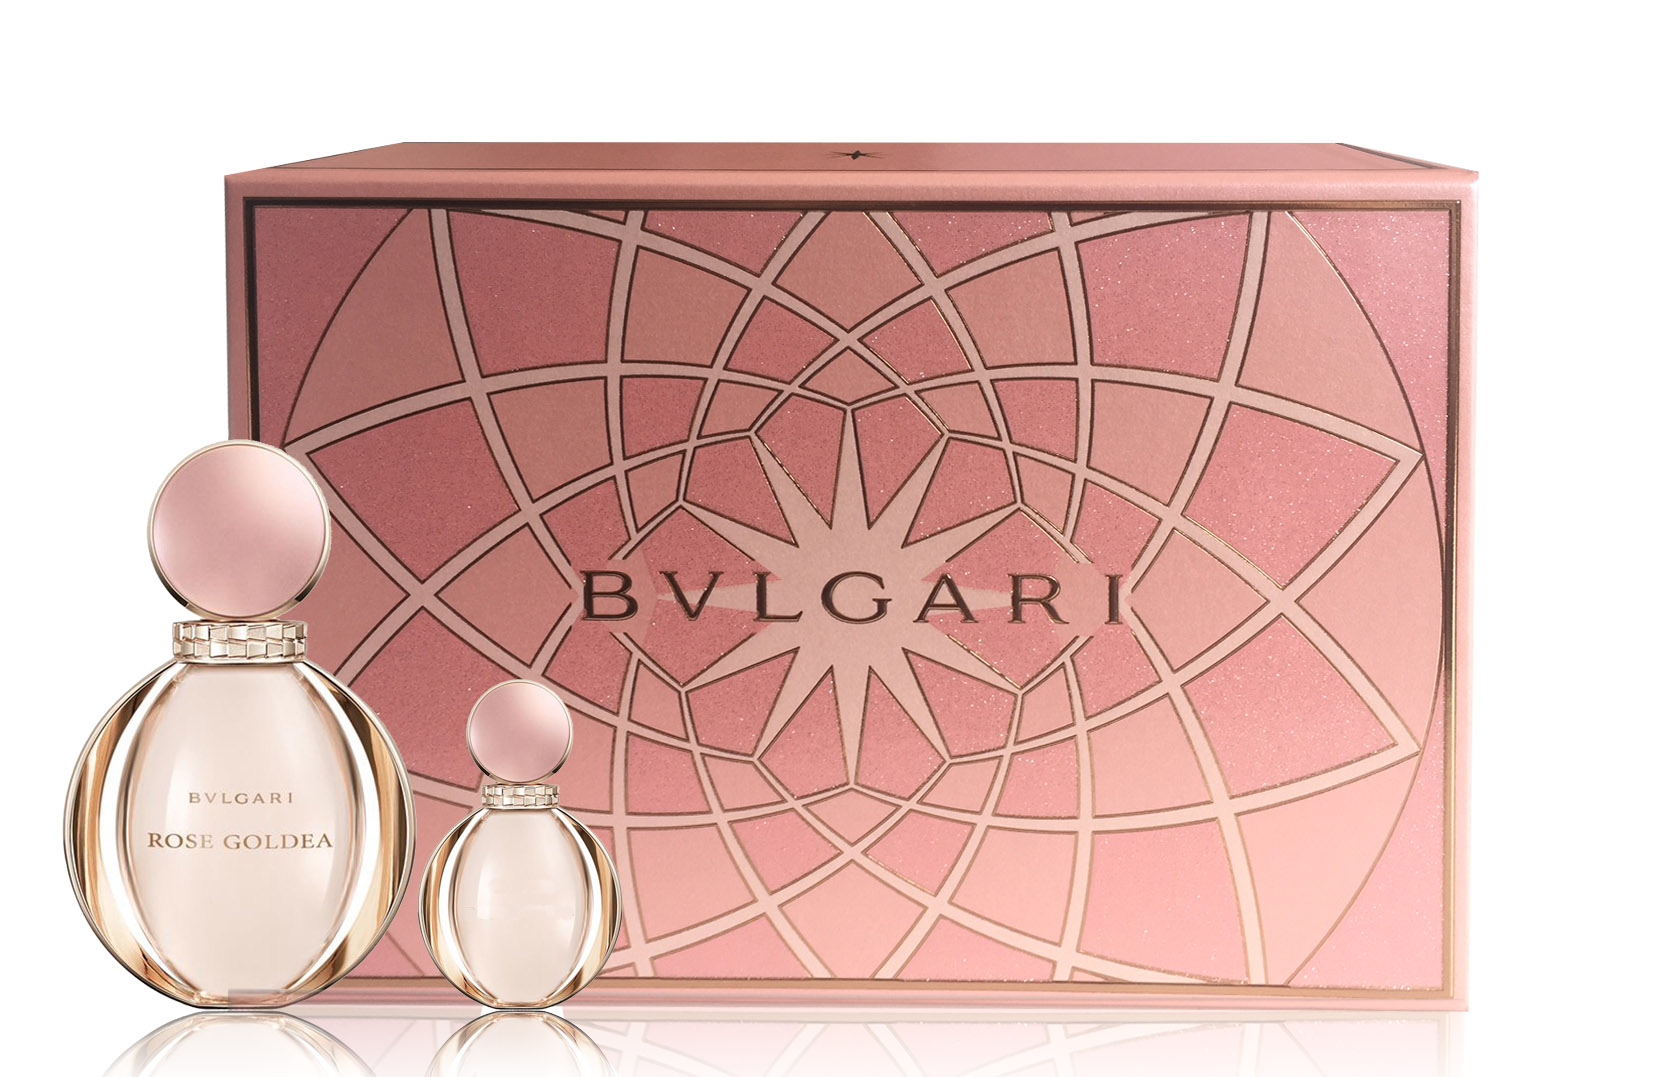 8587553c5ec Bvlgari Goldea rose eau de parfum 50 ml vapo + eau de parfum 15ml